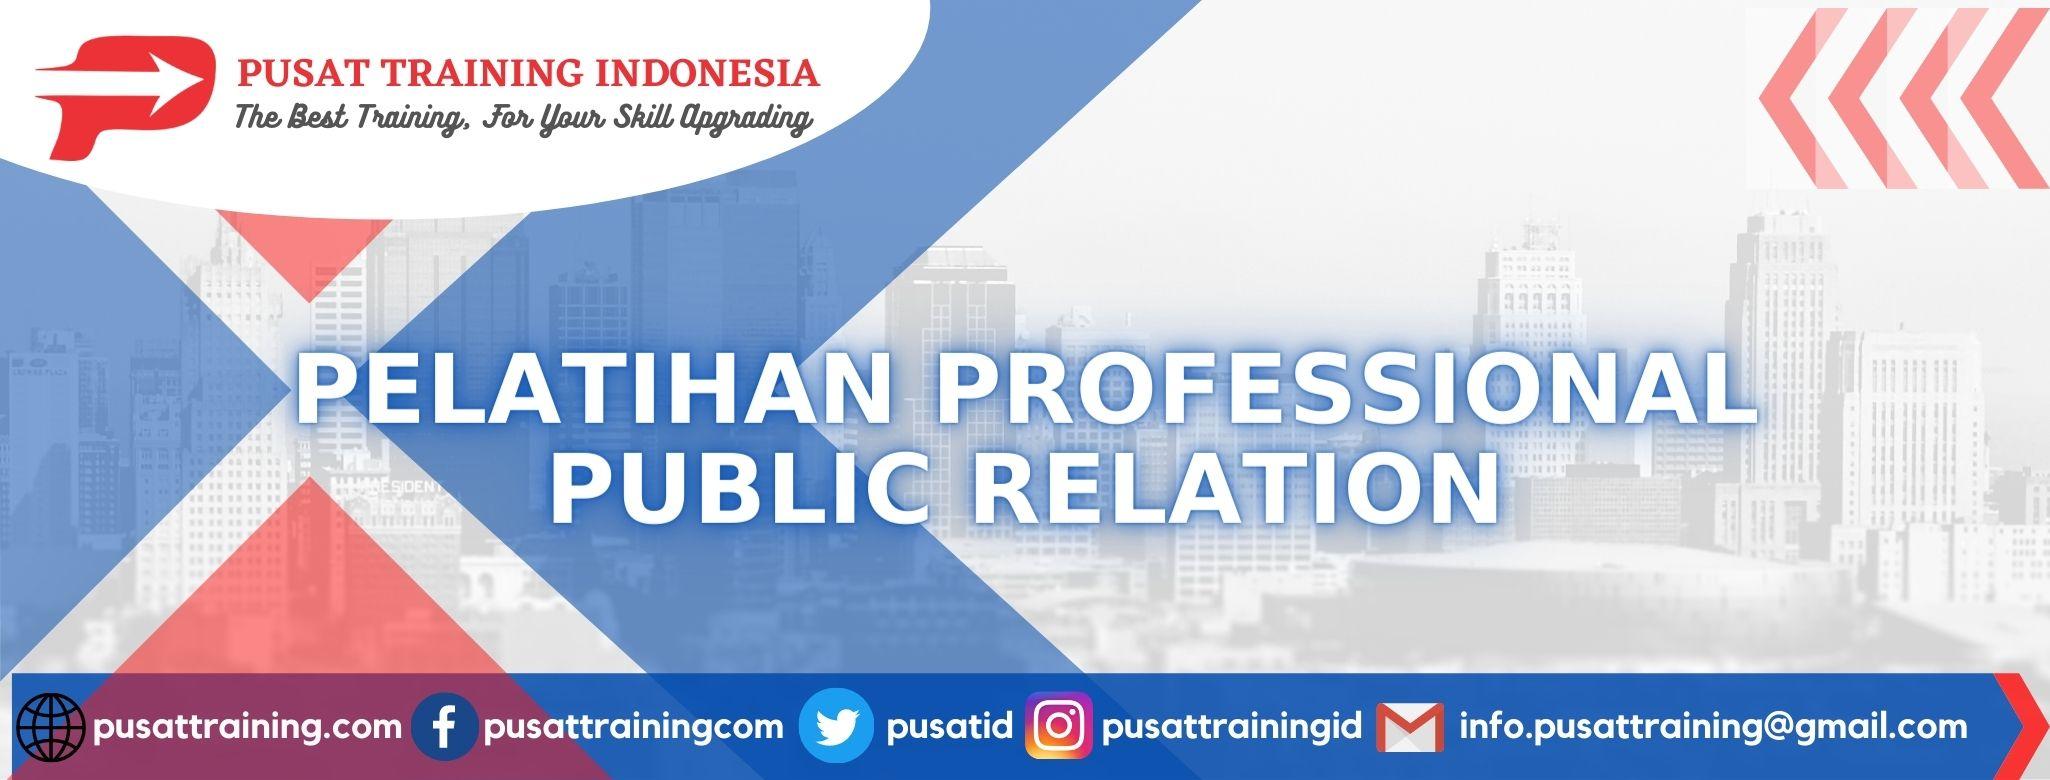 pelatihan-professional-public-relation